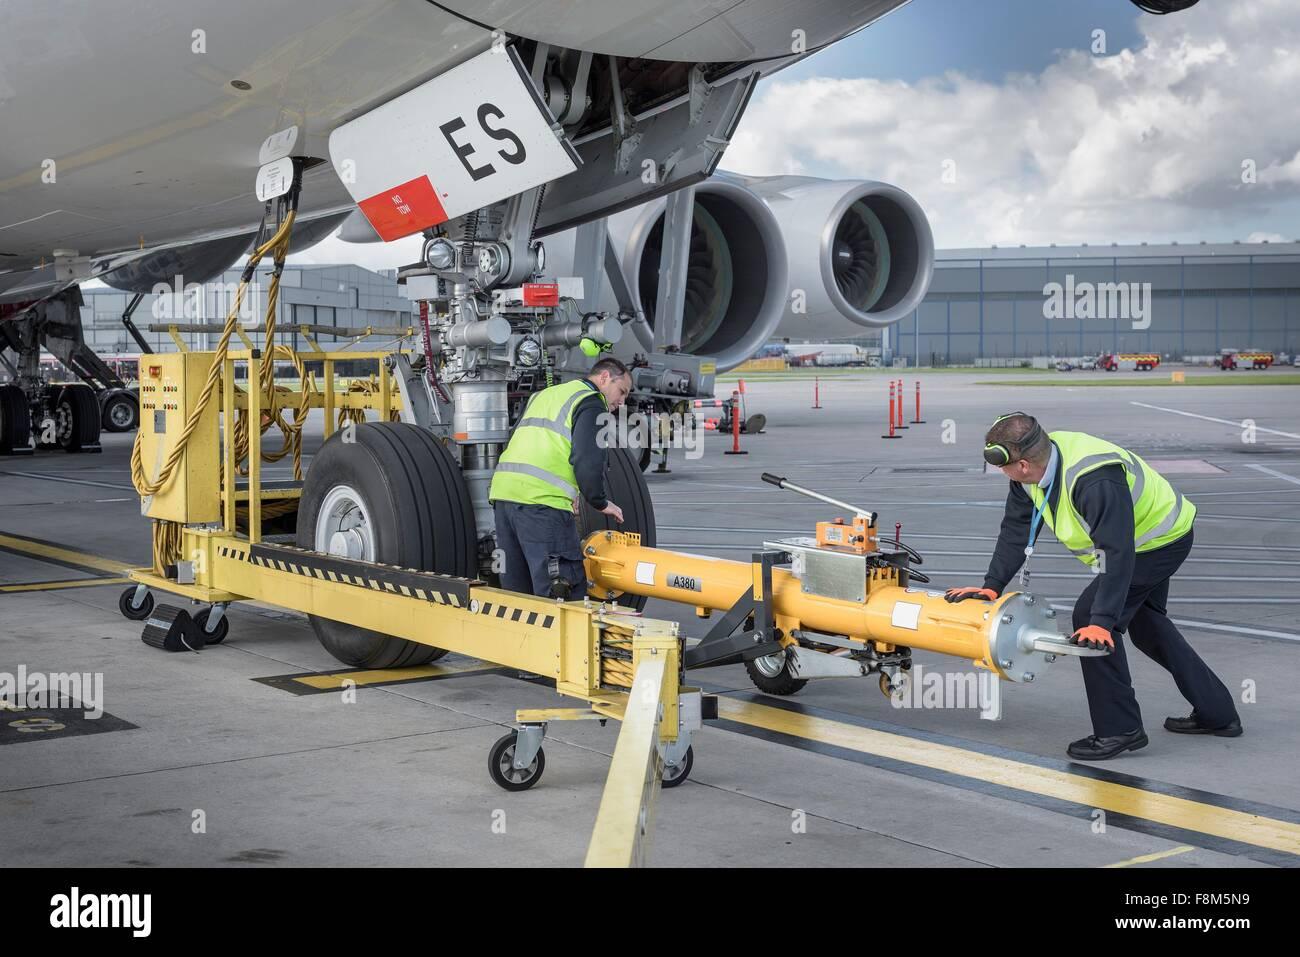 Ground crew fixing tow bar onto A380 aircraft at airport - Stock Image